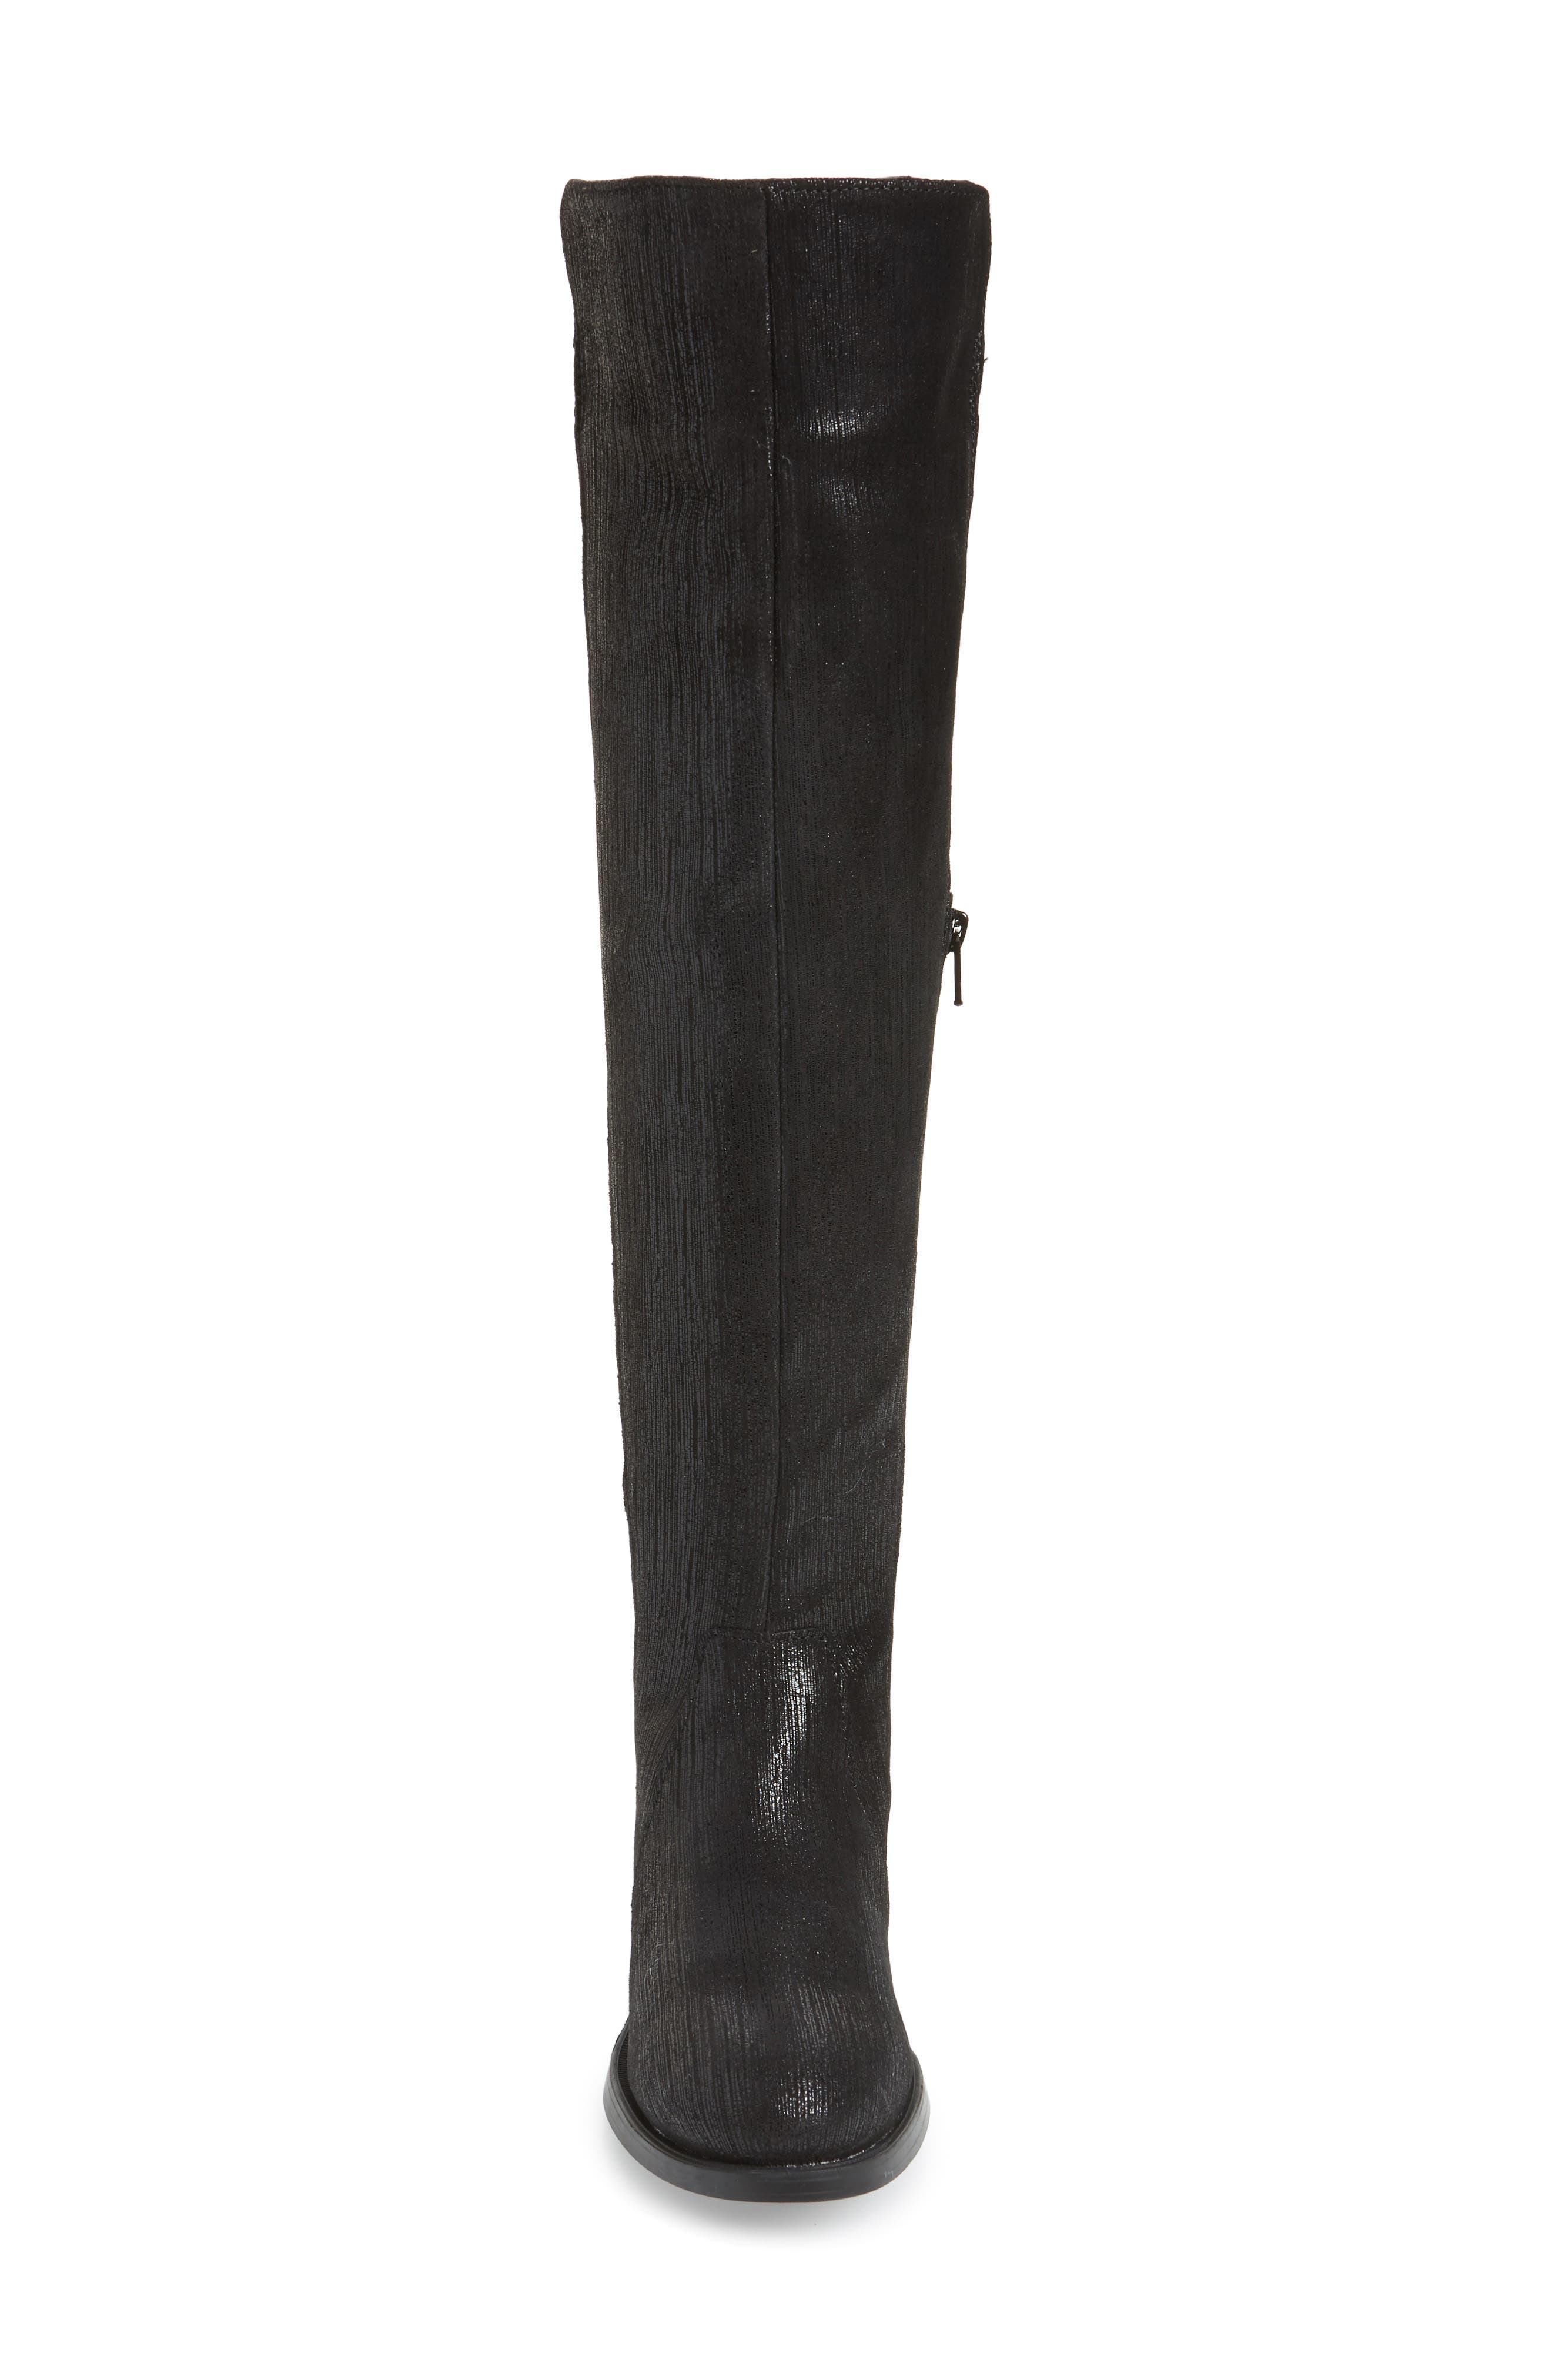 Bunt Waterproof Over the Knee Boot,                             Alternate thumbnail 3, color,                             Black Metal/ Lycra